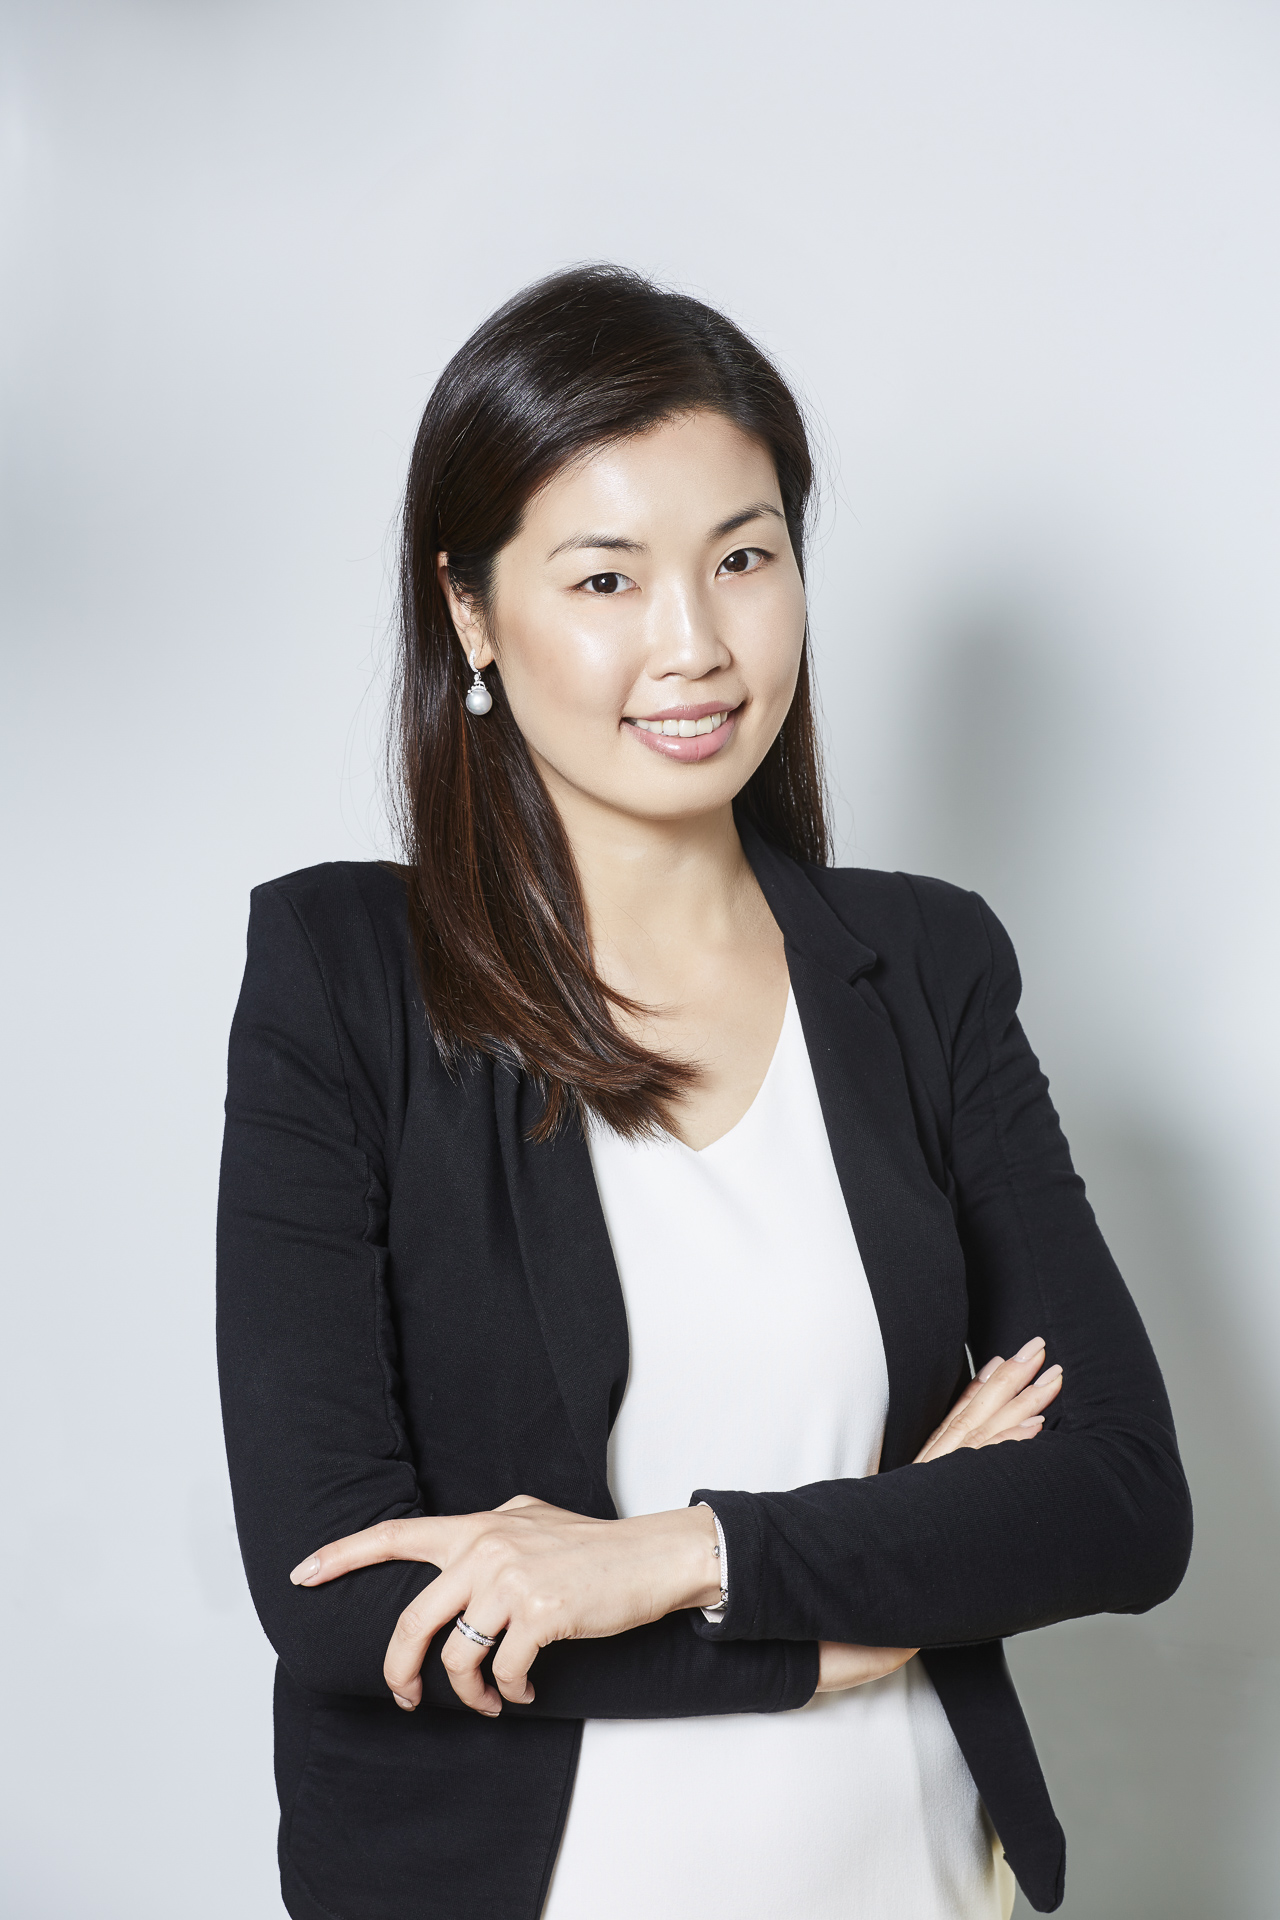 Corporate-Portrait-Photography-Singapore_0003